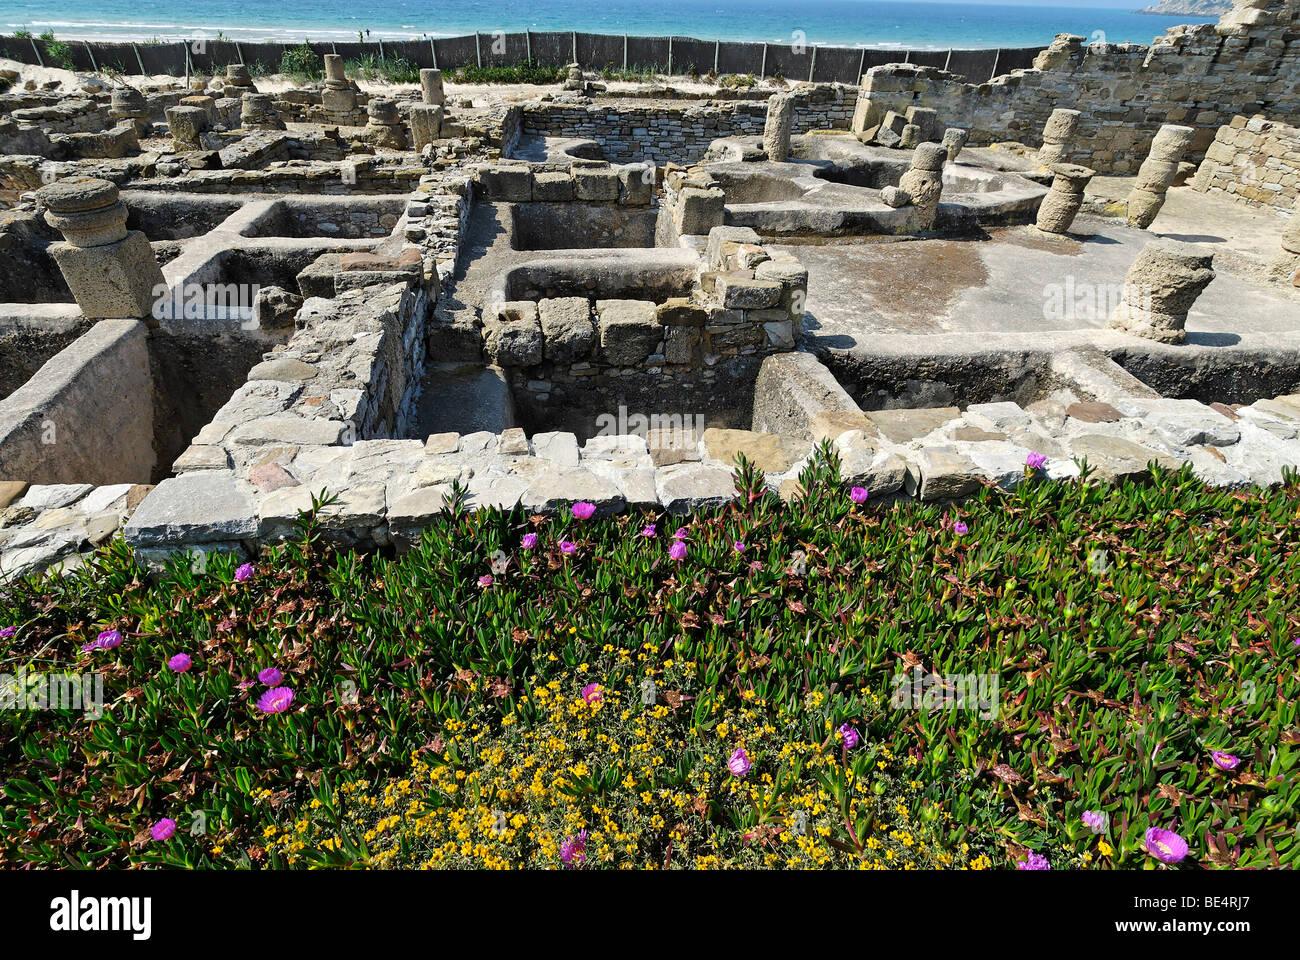 Ruins of the factory for garum, archeologic park Baelo Claudia near Tarifa, Andalusia, Spain, Europe - Stock Image